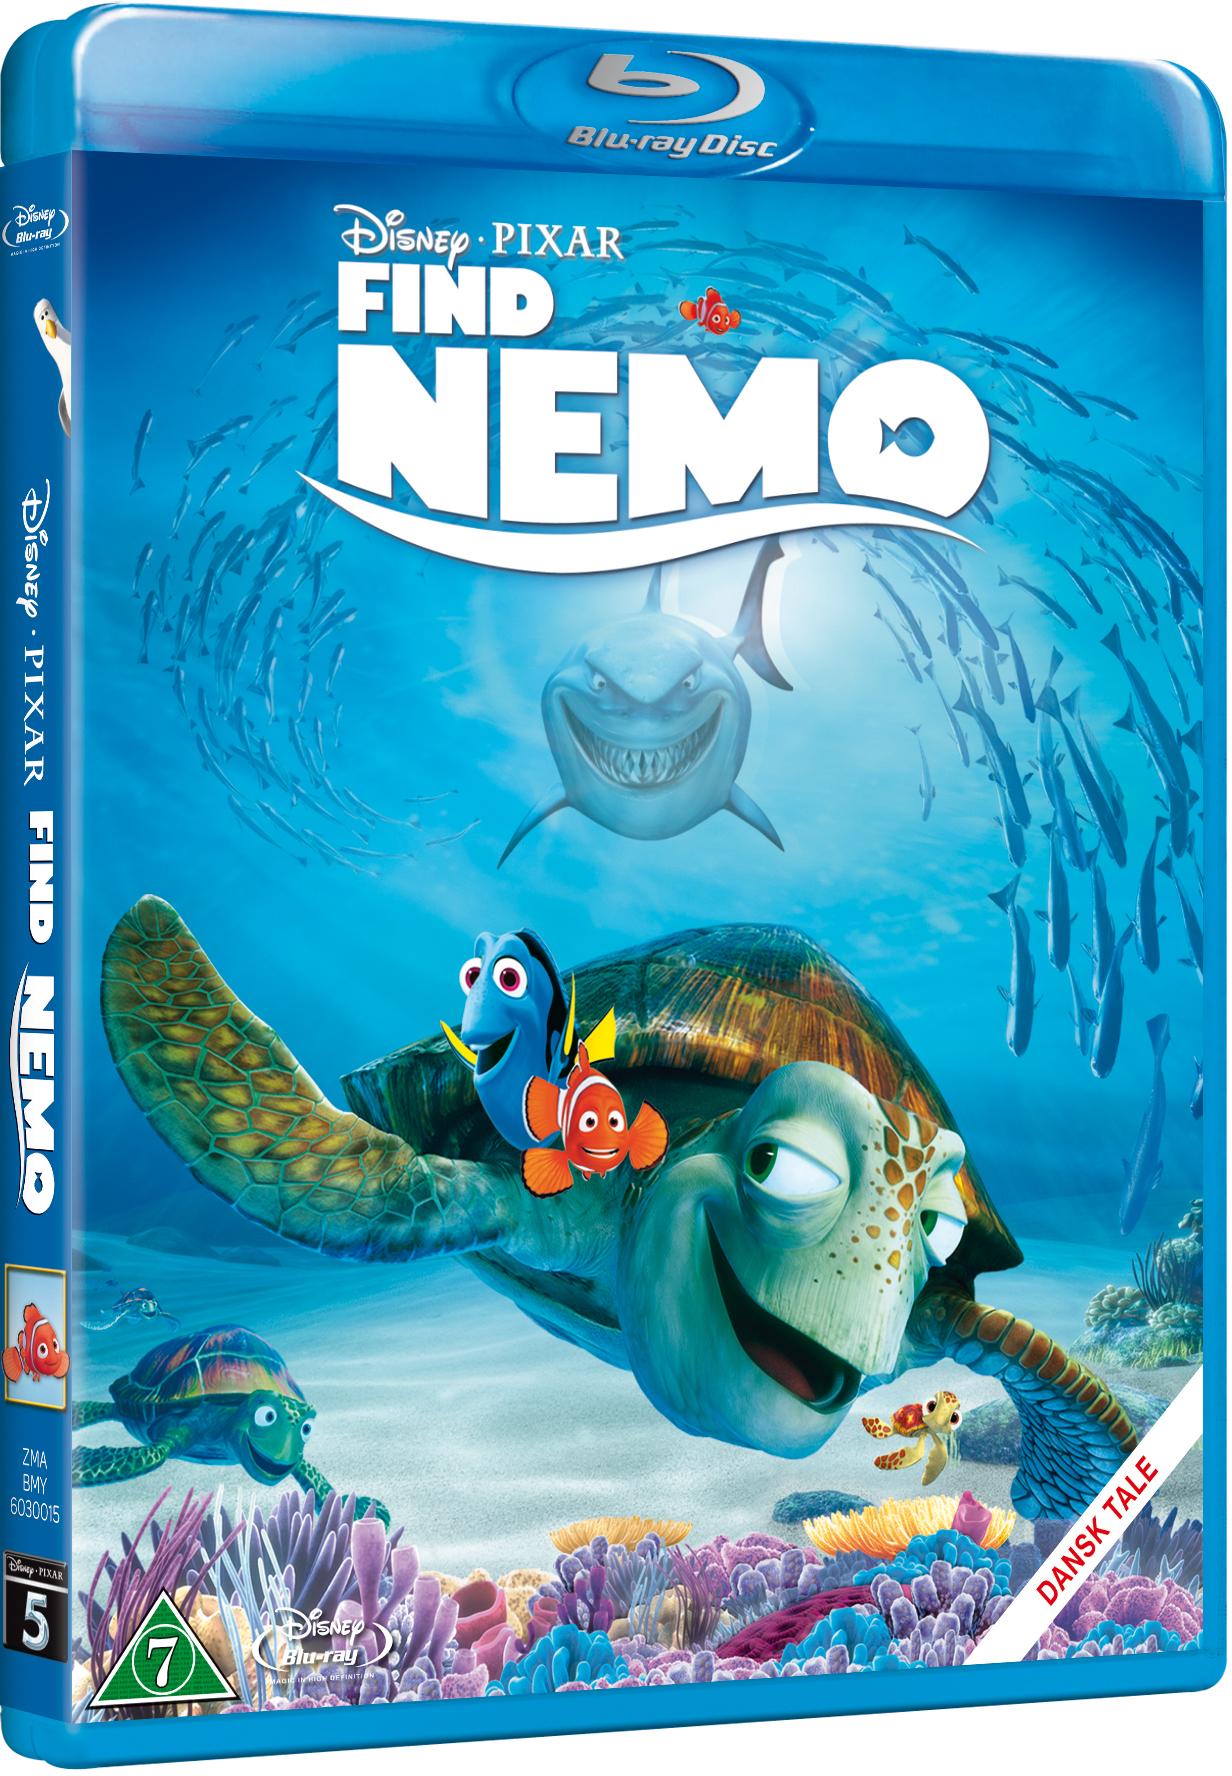 Find Nemo Pixar #5